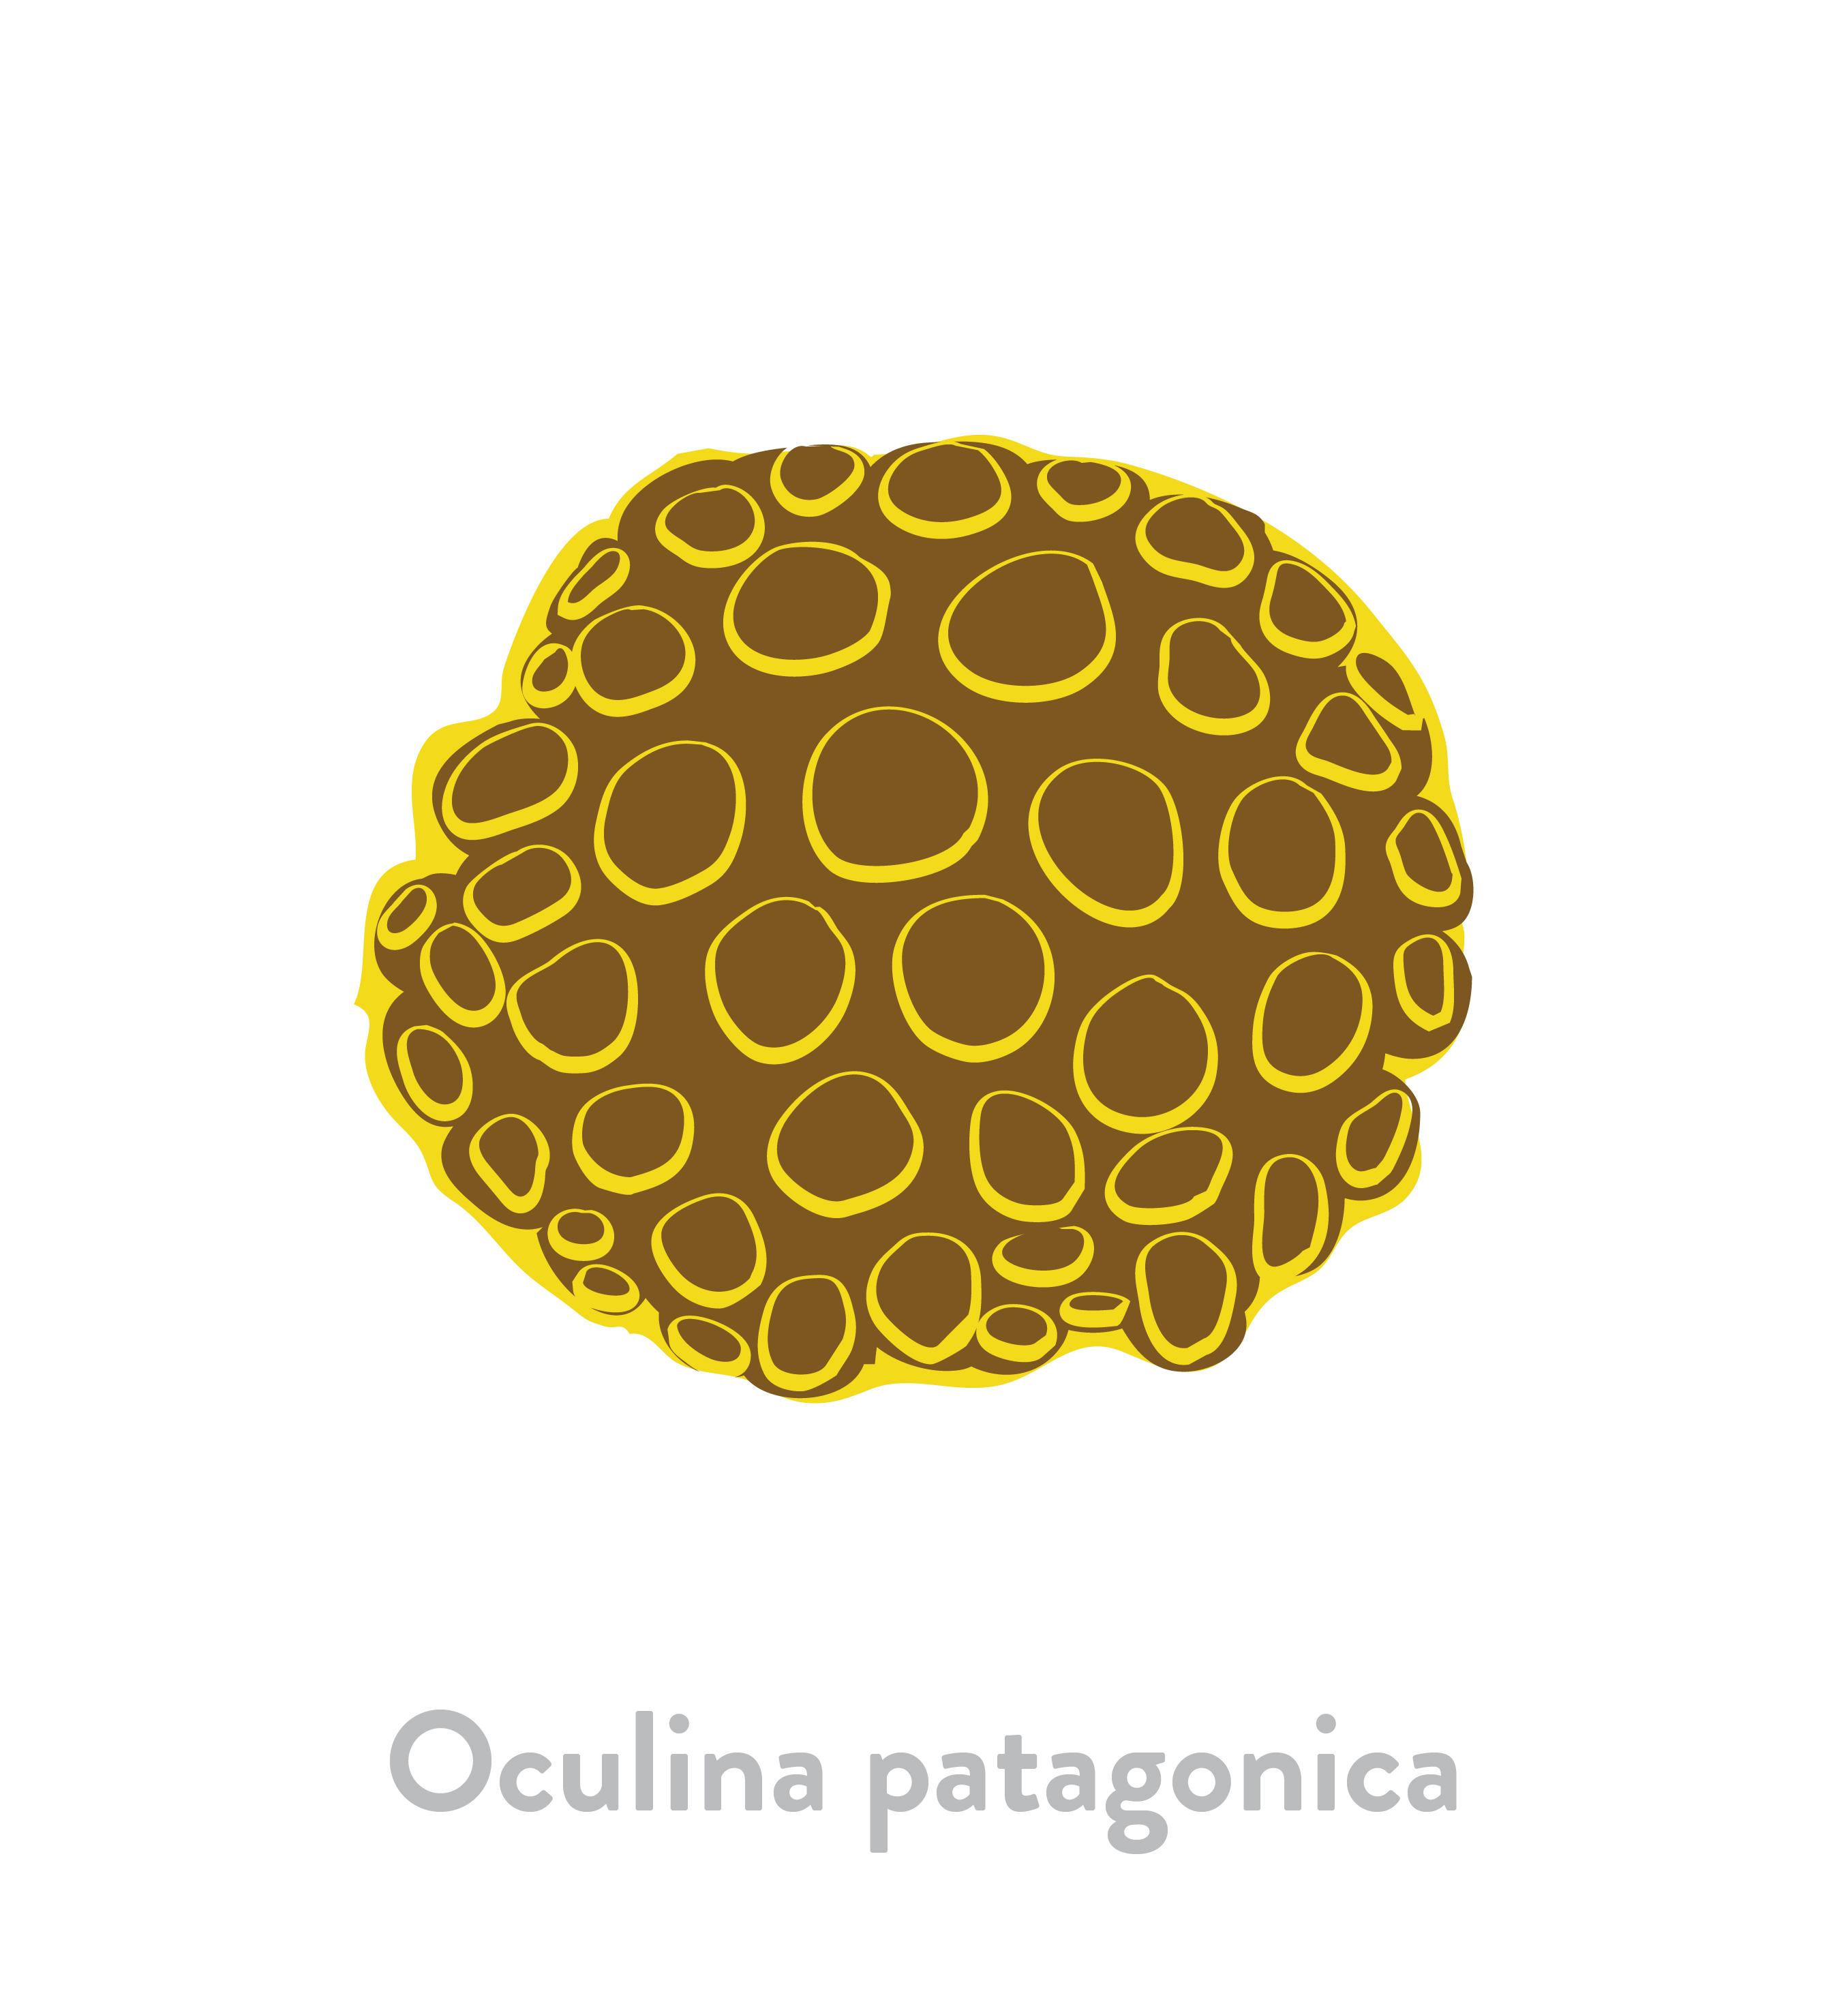 Oculina patagonica